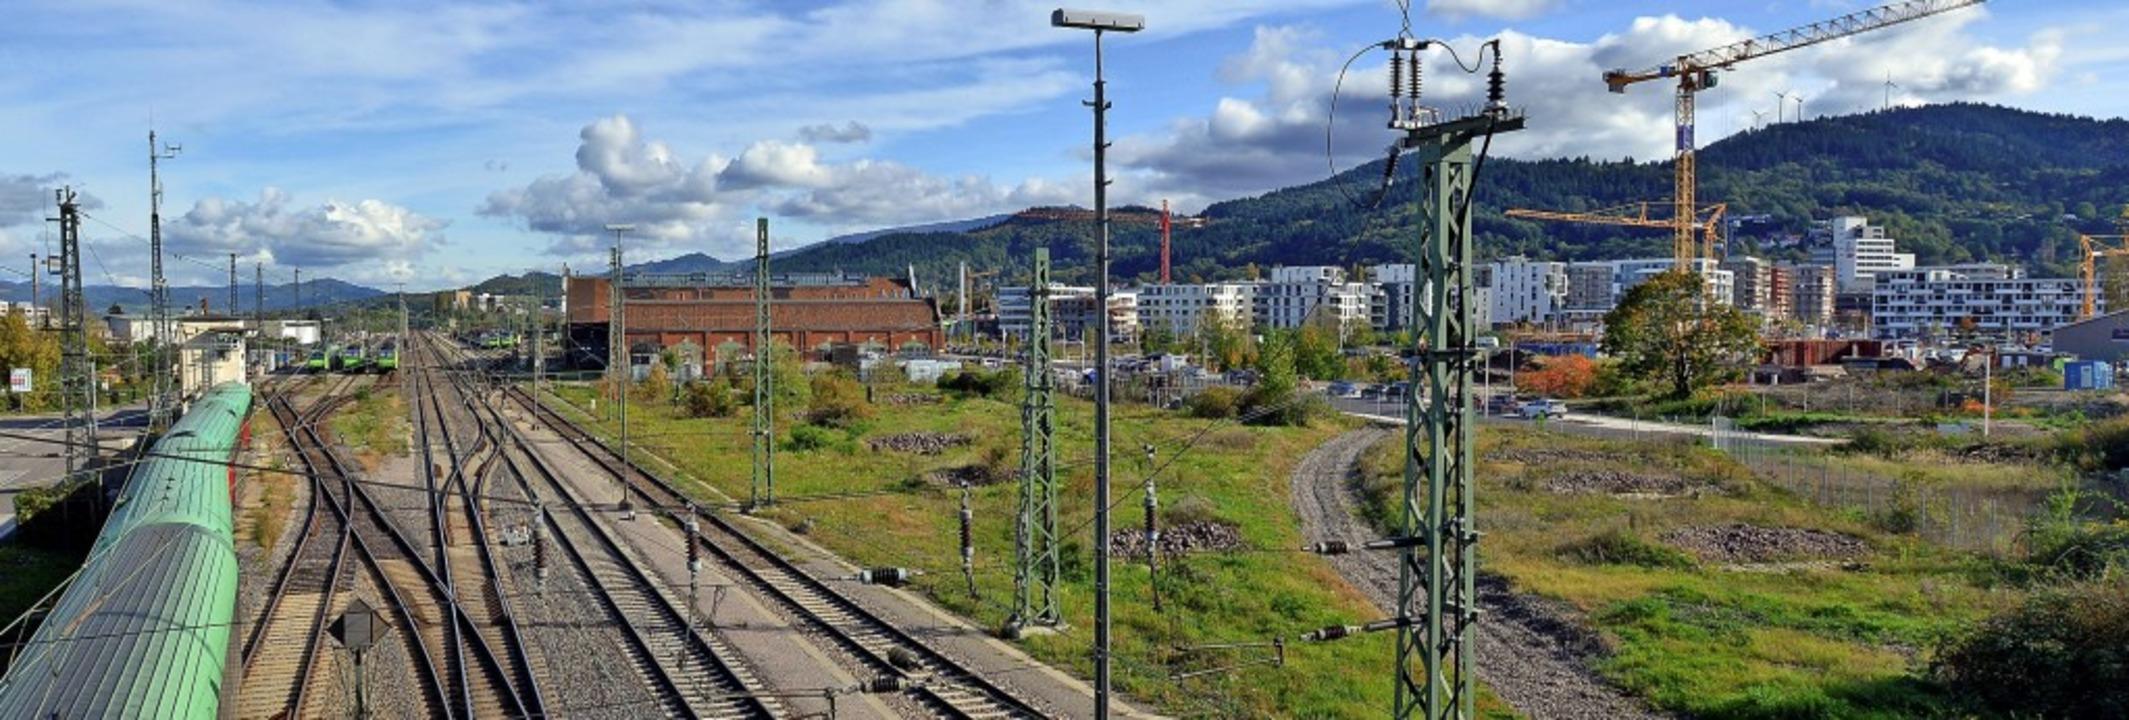 Das neue Quartier Brühl-Güterbahnhof l...n-Anschluss ist gar nicht so einfach.   | Foto: Michael Bamberger